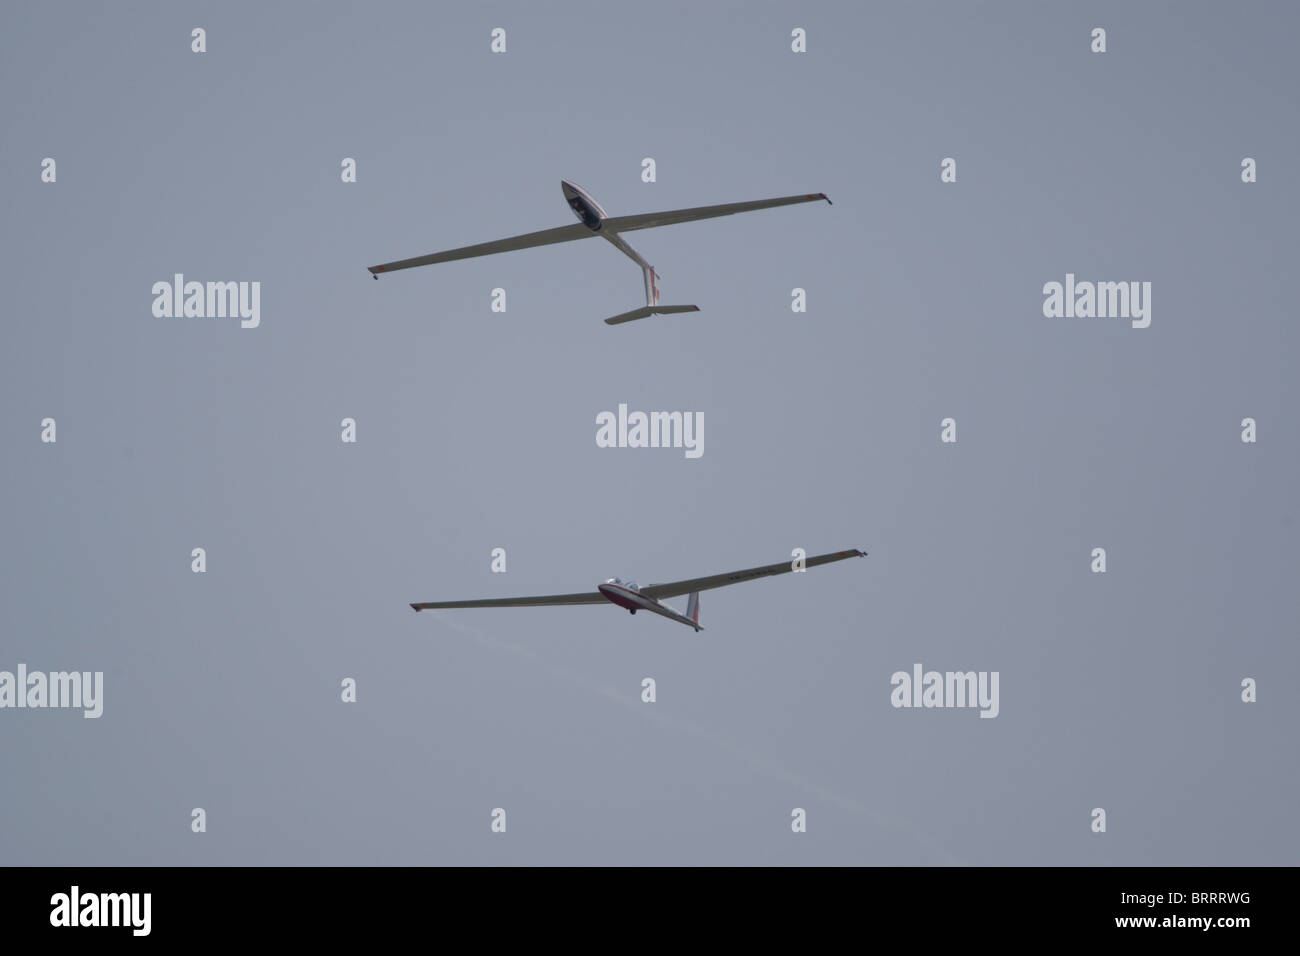 glider sailplane airplane airshow aircraft gliding sky blue stock